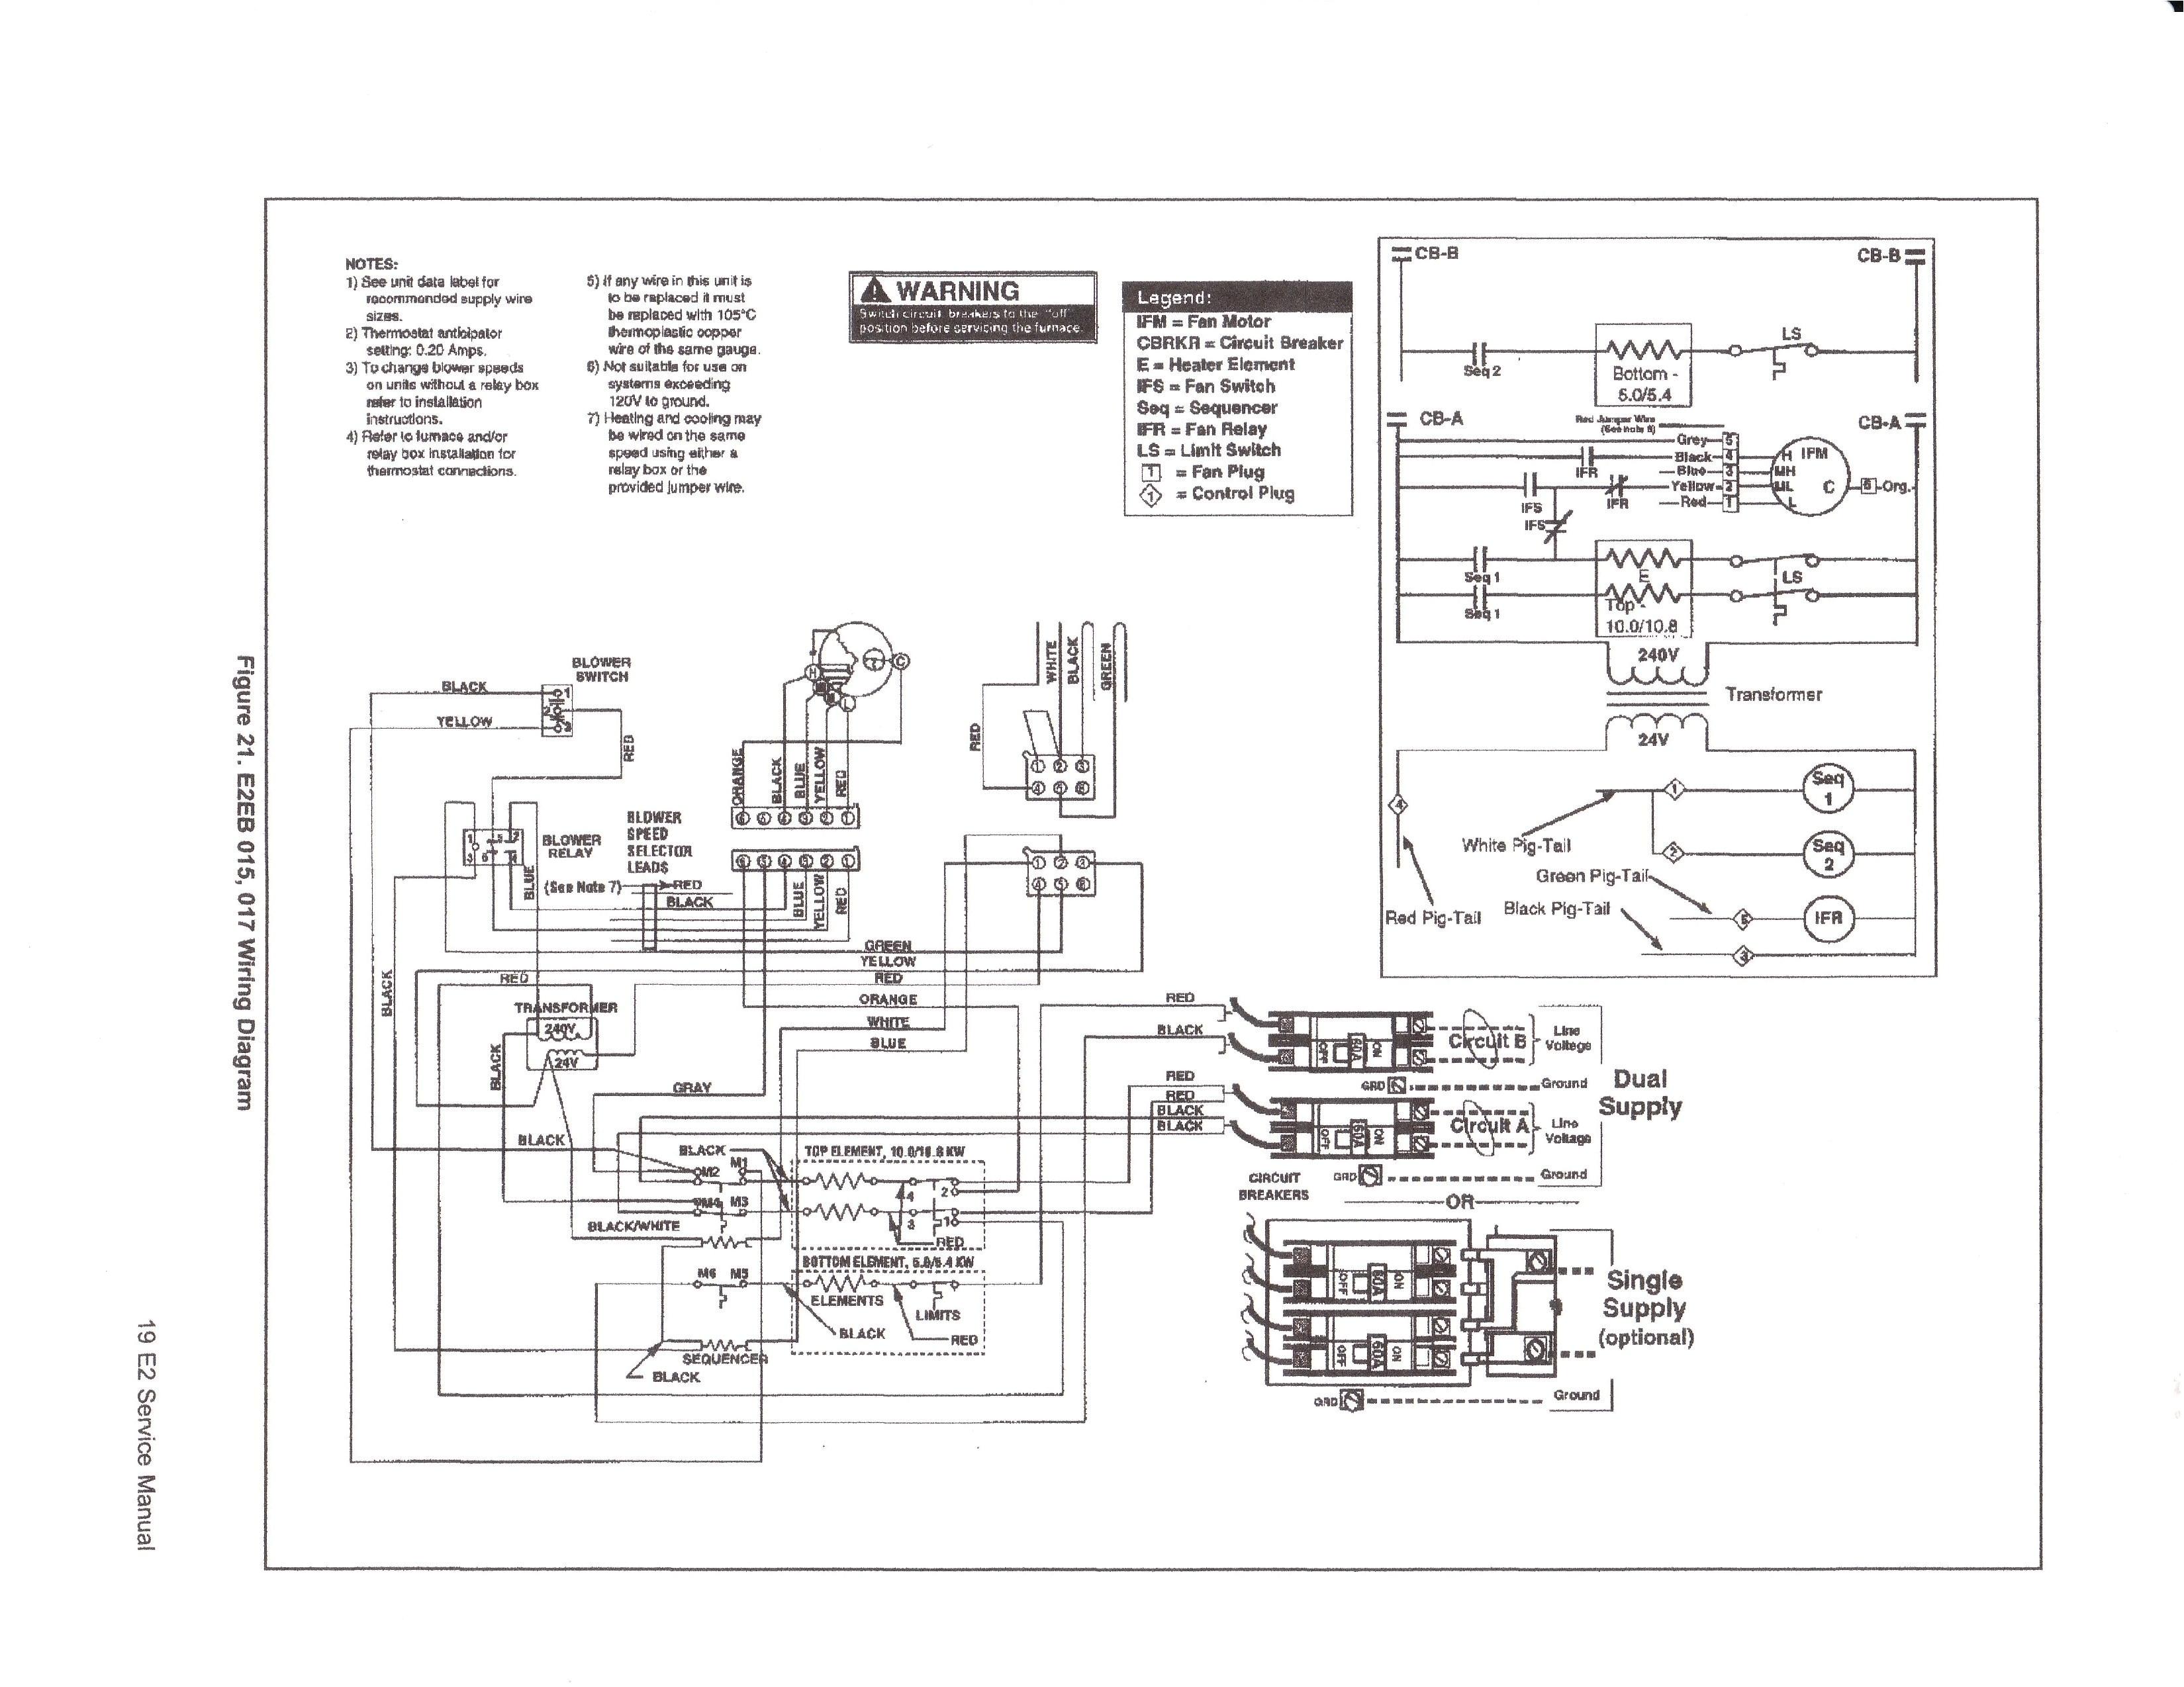 E2eb 017ha Wiring Diagram nordyne Electric Furnace Wiring Diagram Wiring Diagram Database